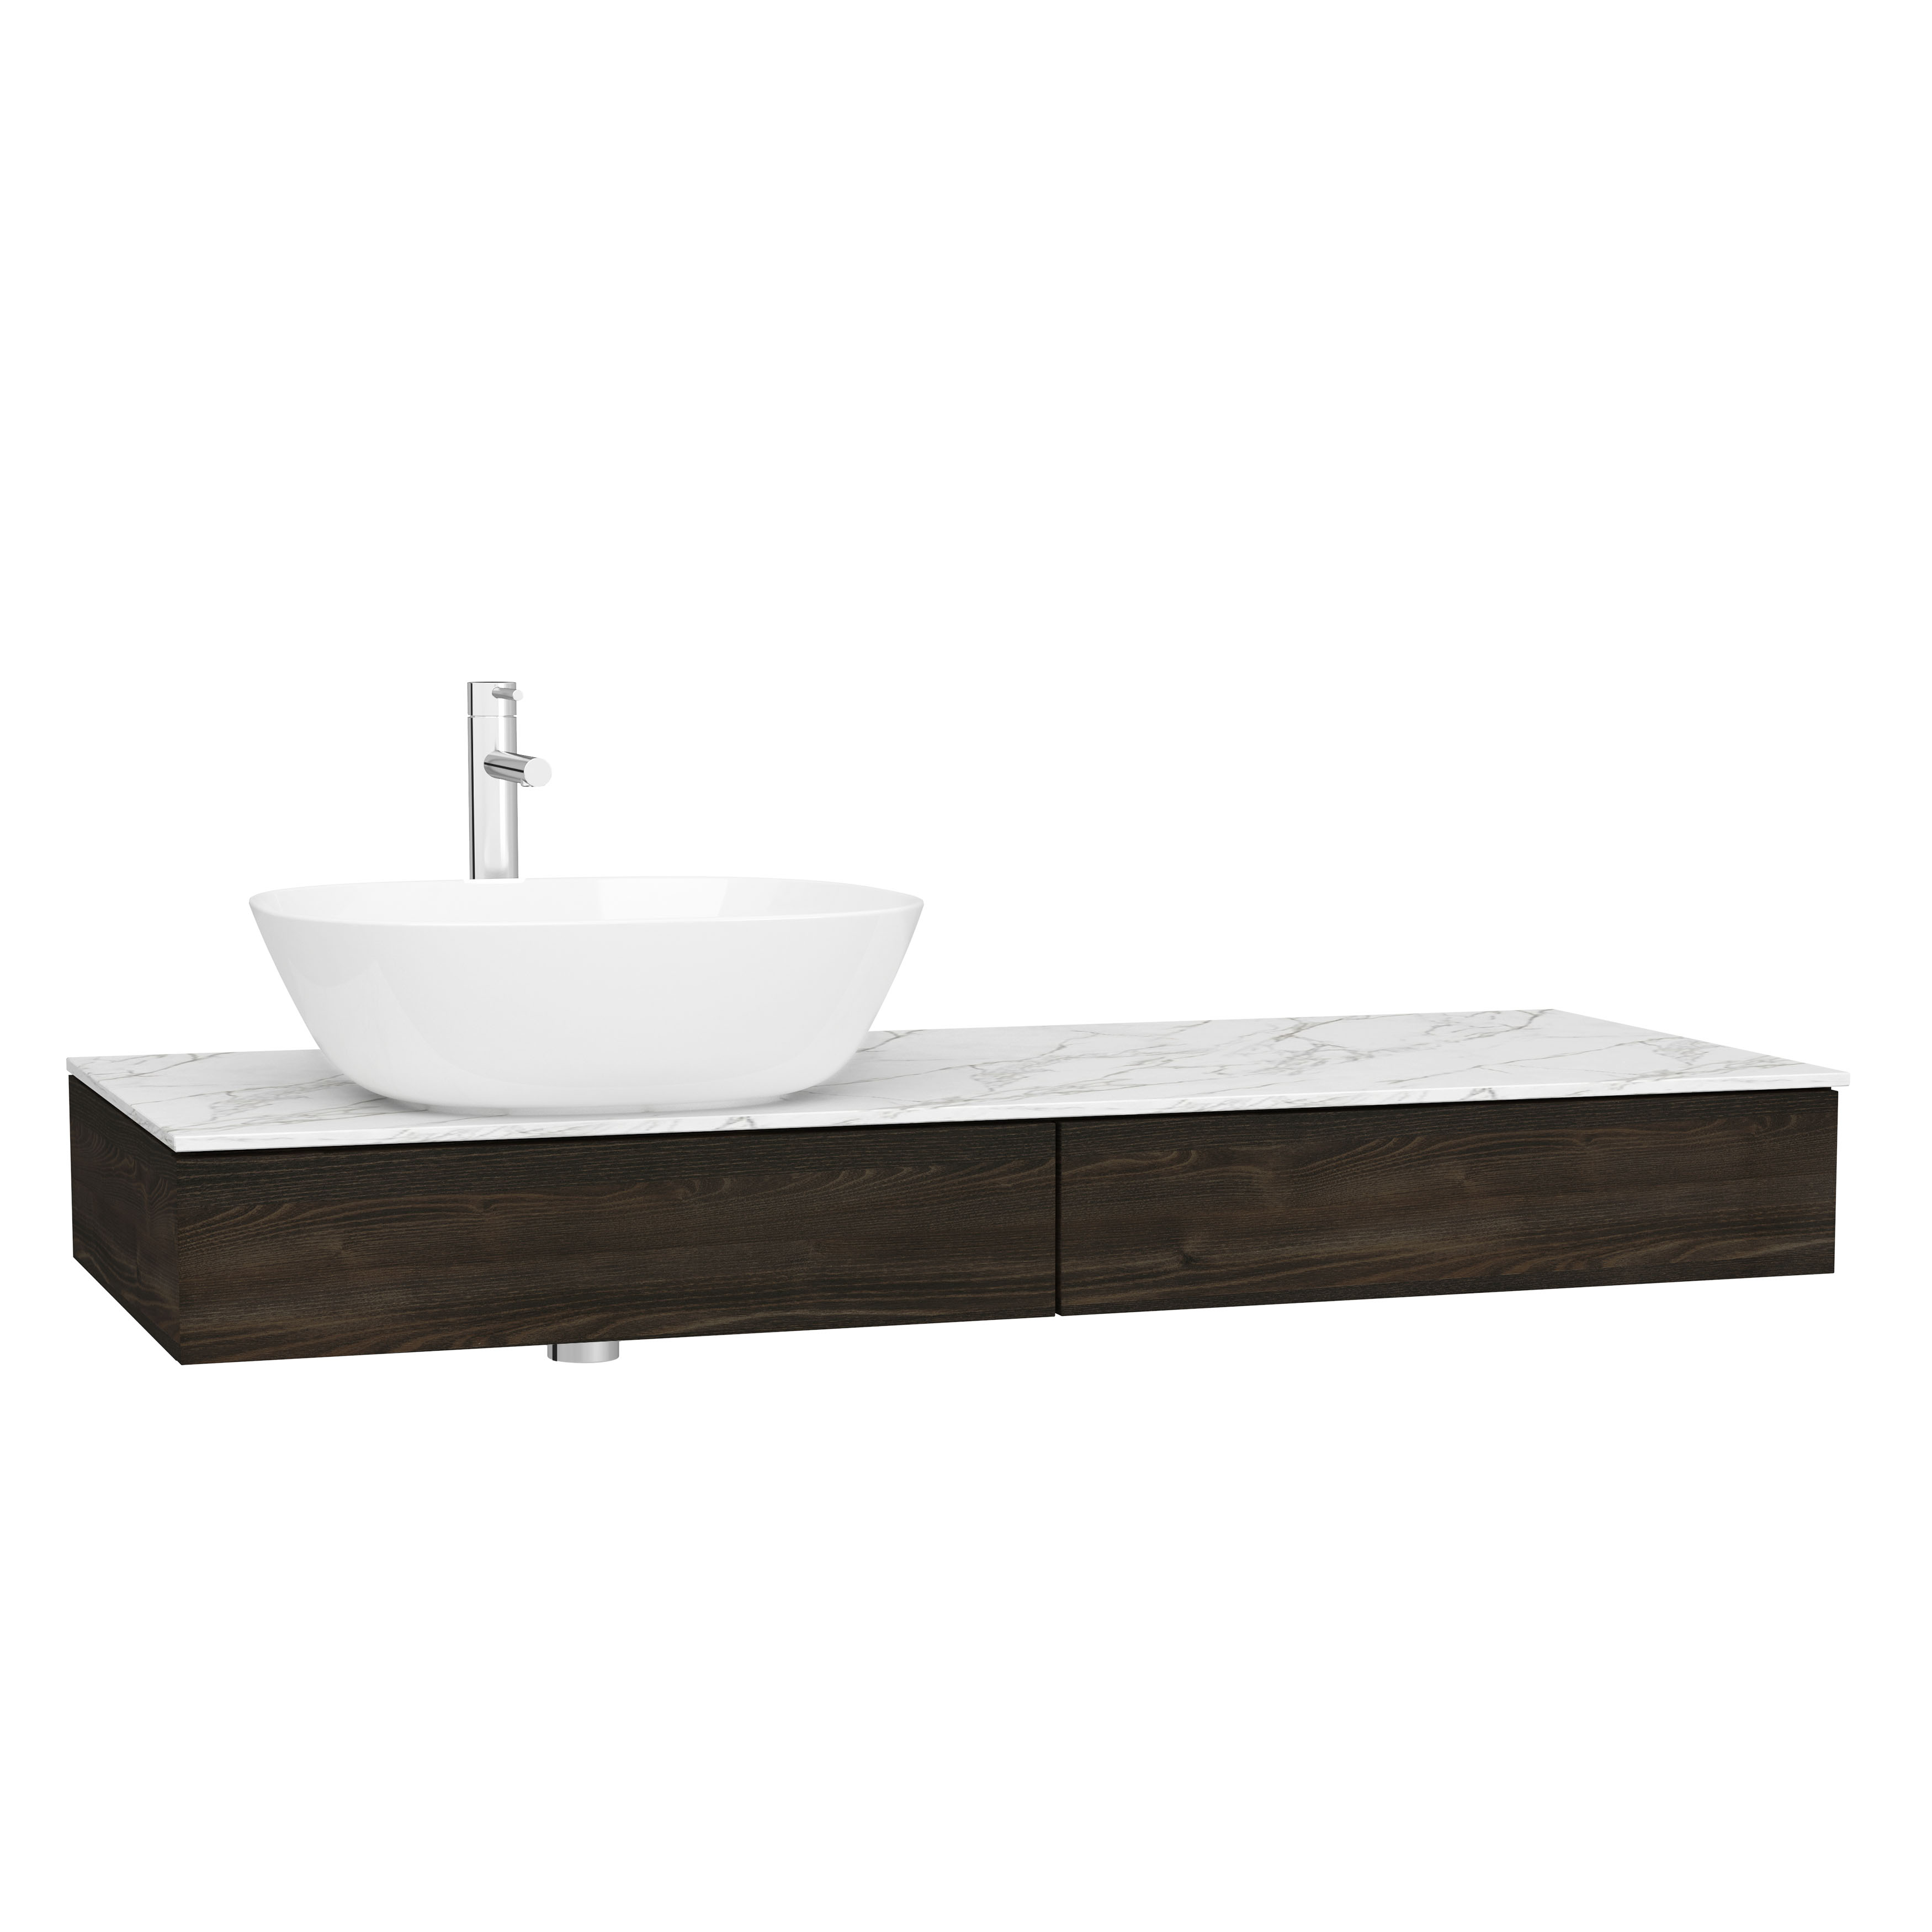 Origin plan de toilette avec tiroir, 120 cm, orme, gauche